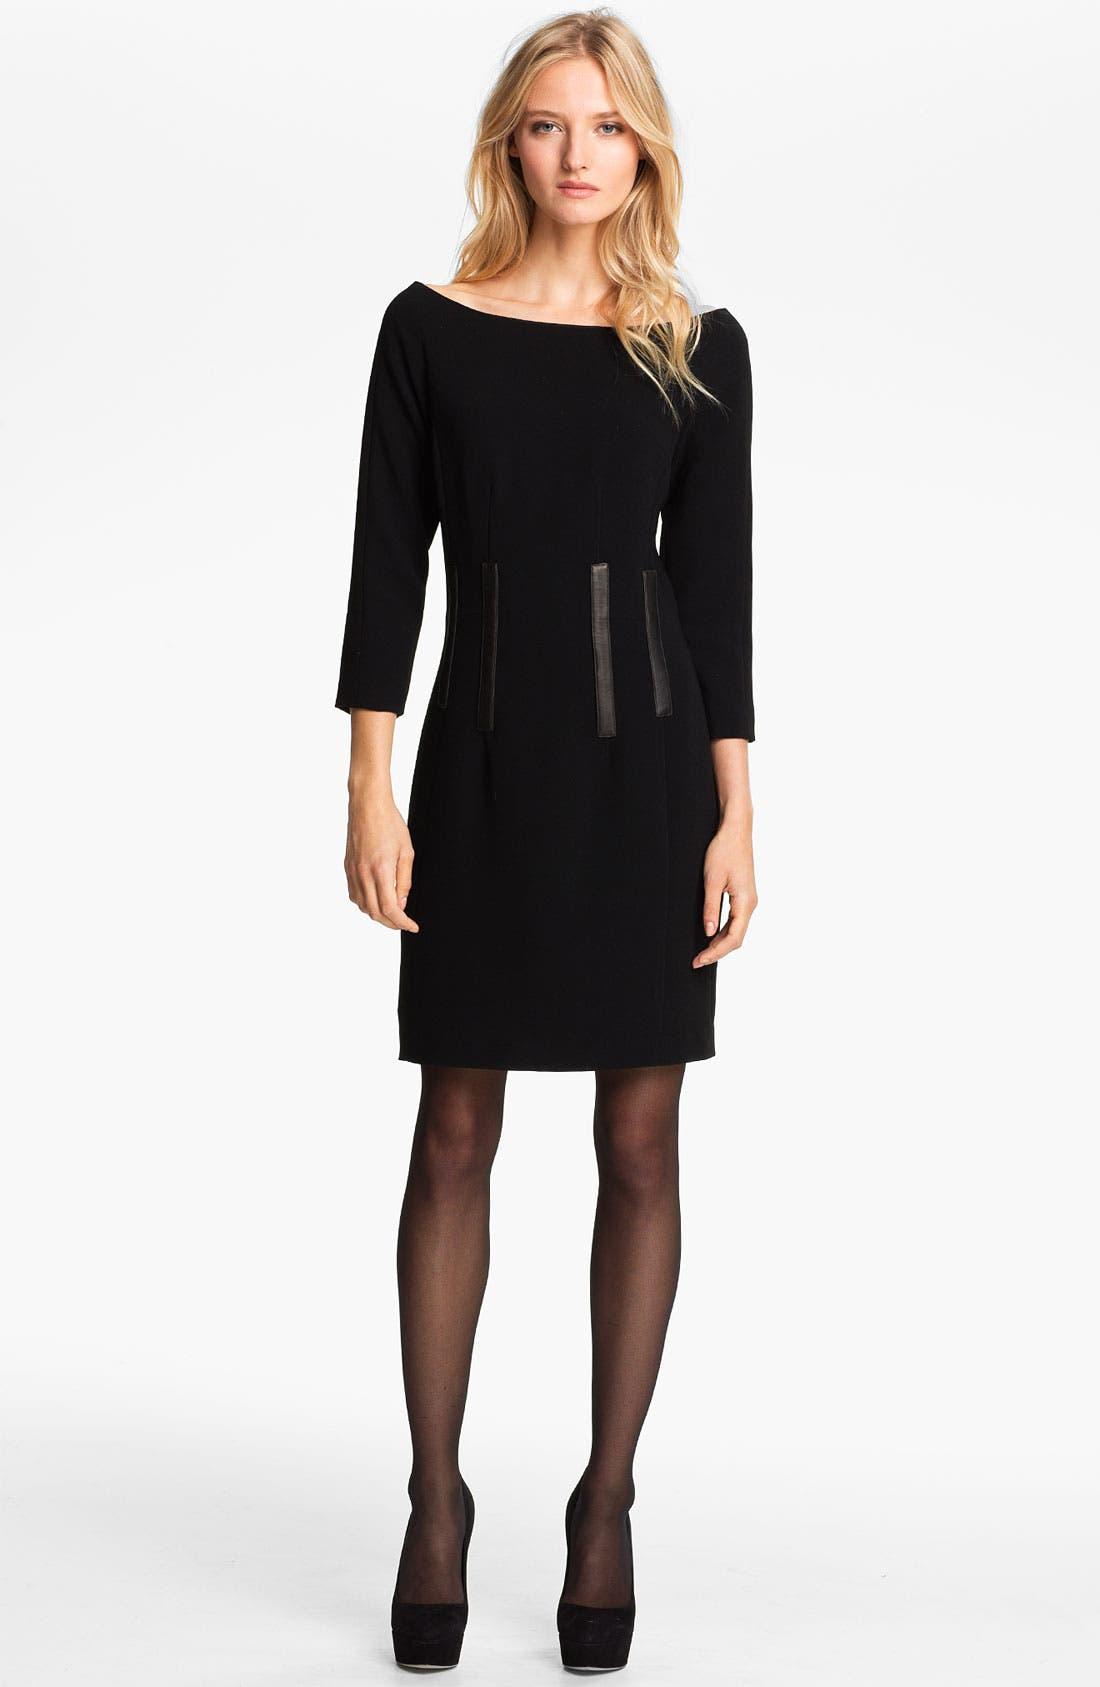 Main Image - rag & bone 'Imogen' Leather Trim Dress